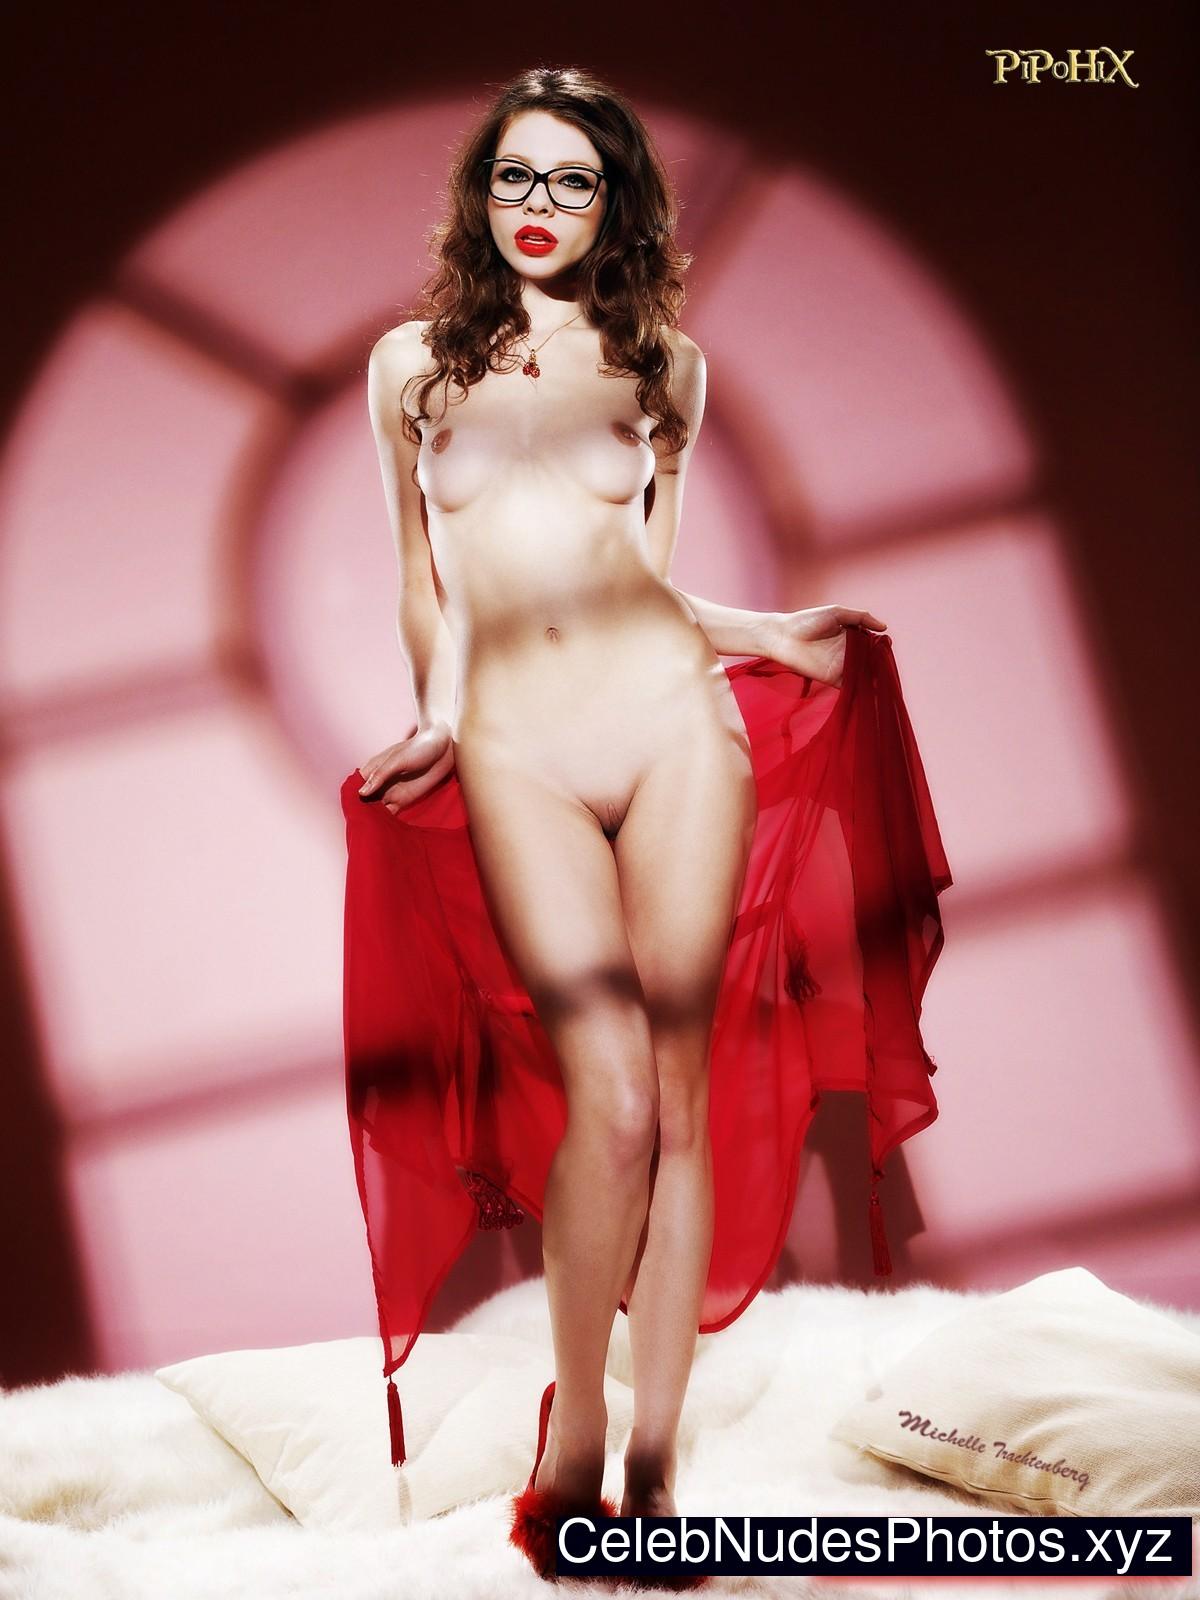 Michelle Trachtenberg Free Nude Celeb sexy 6